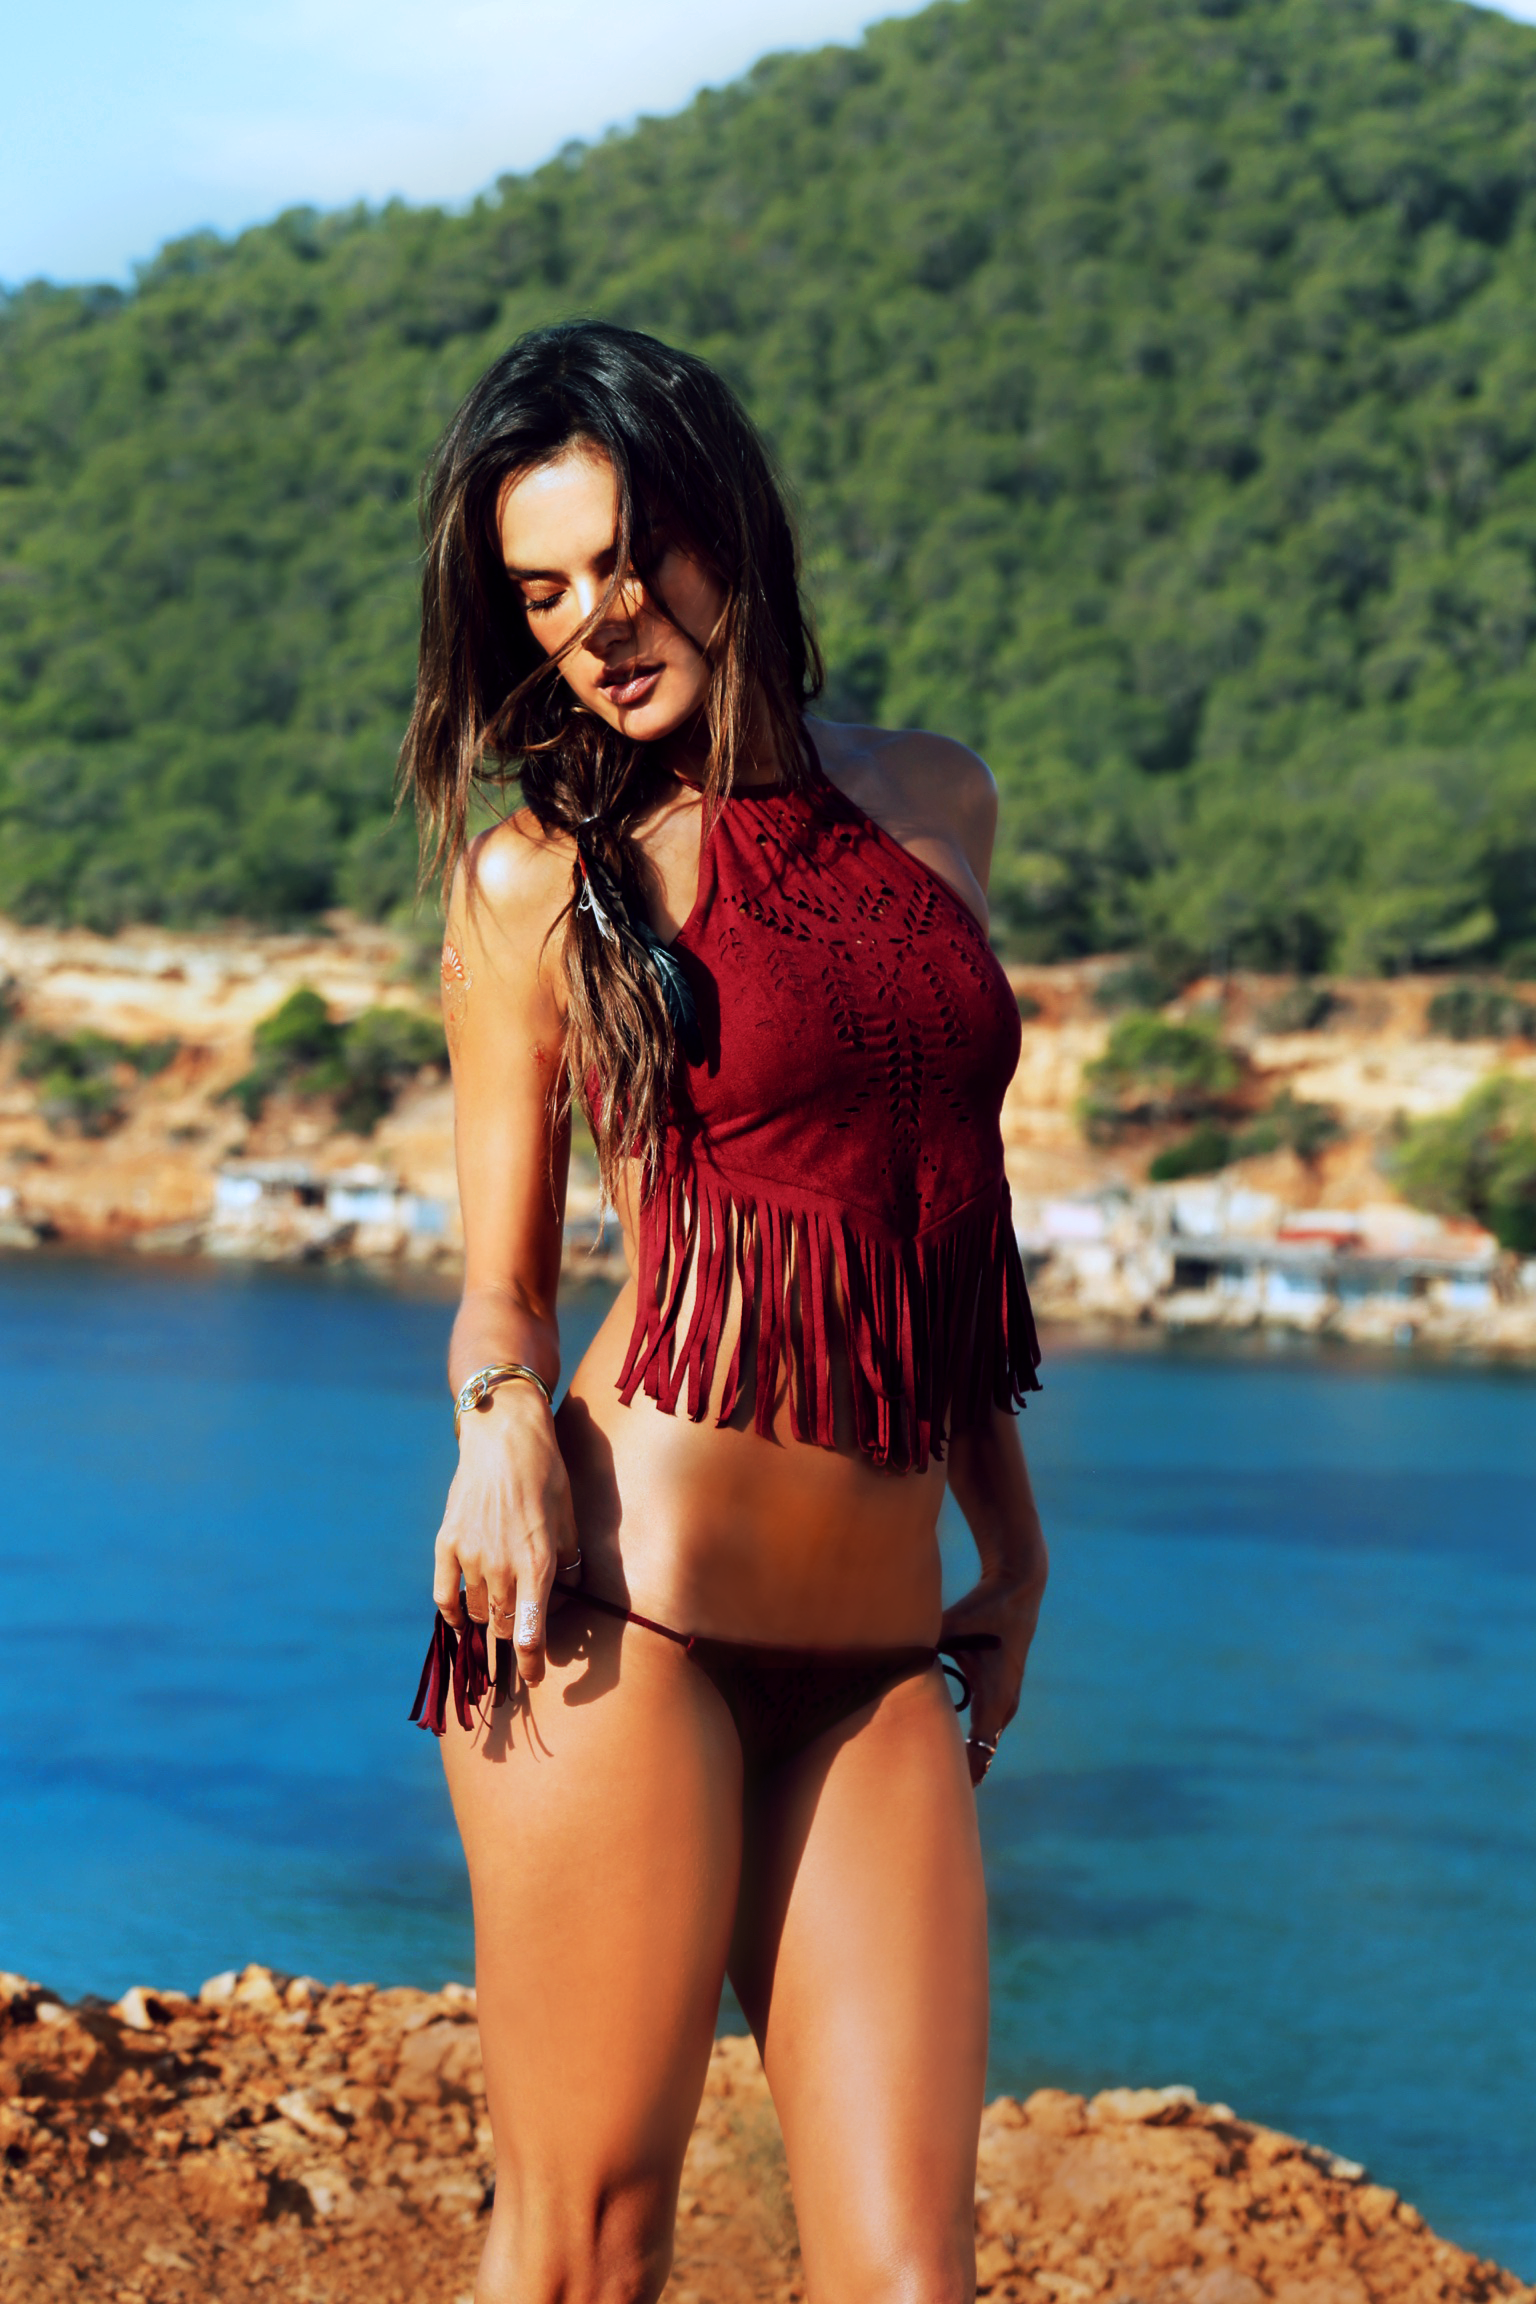 ale-by-alessandra '16-red-fringe-bikini-alessandra-ambrosio